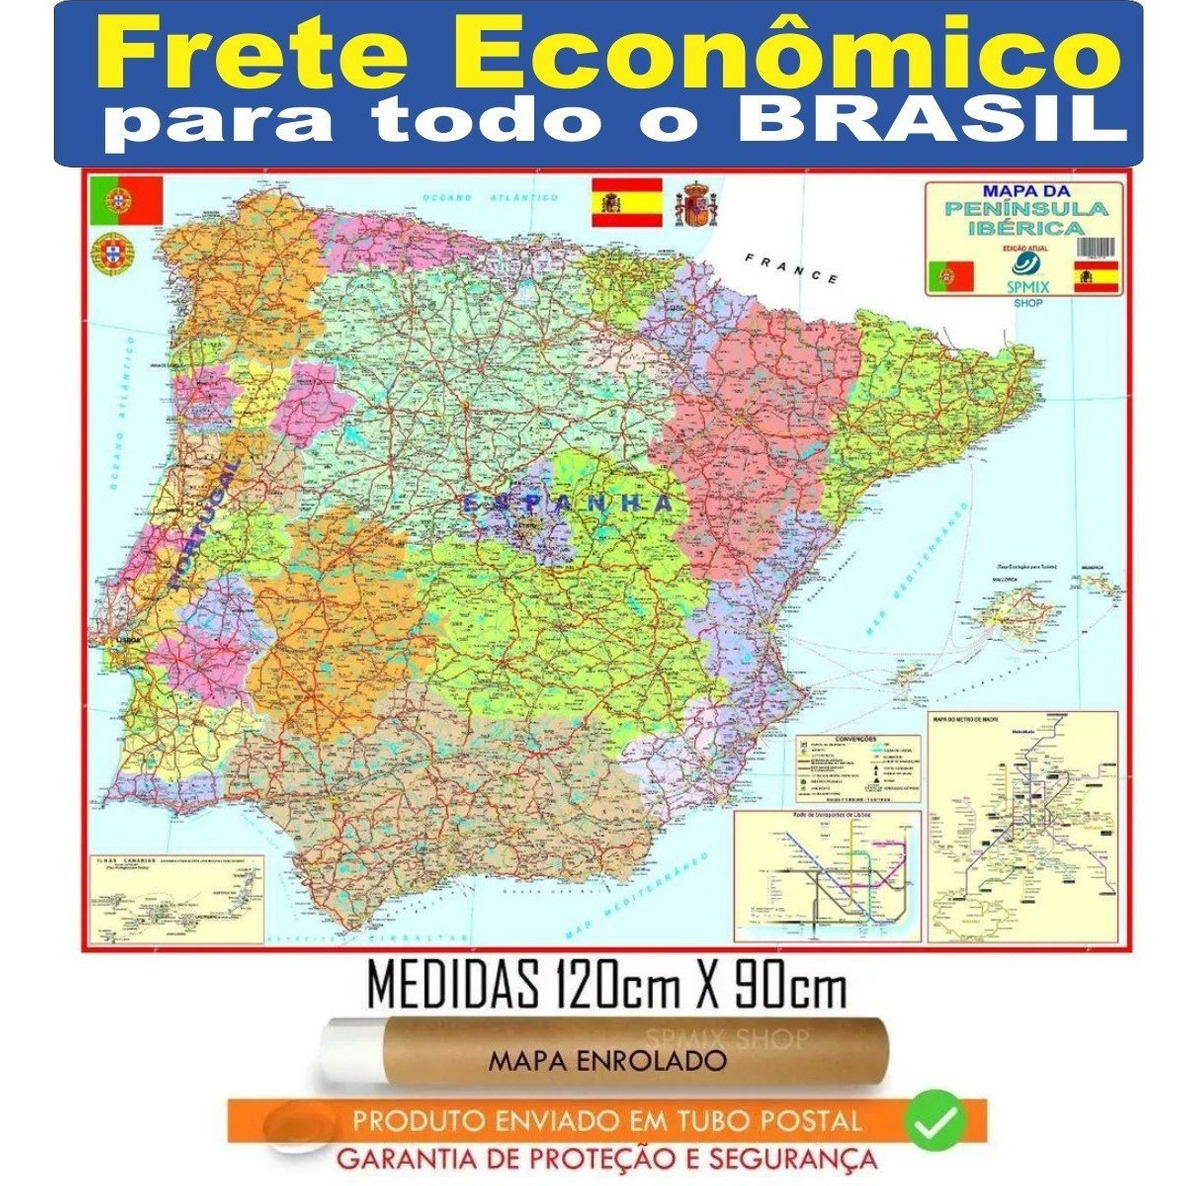 Mapa Portugal Espanha Iberica 120x90cm Enrolado Frete R 20 R